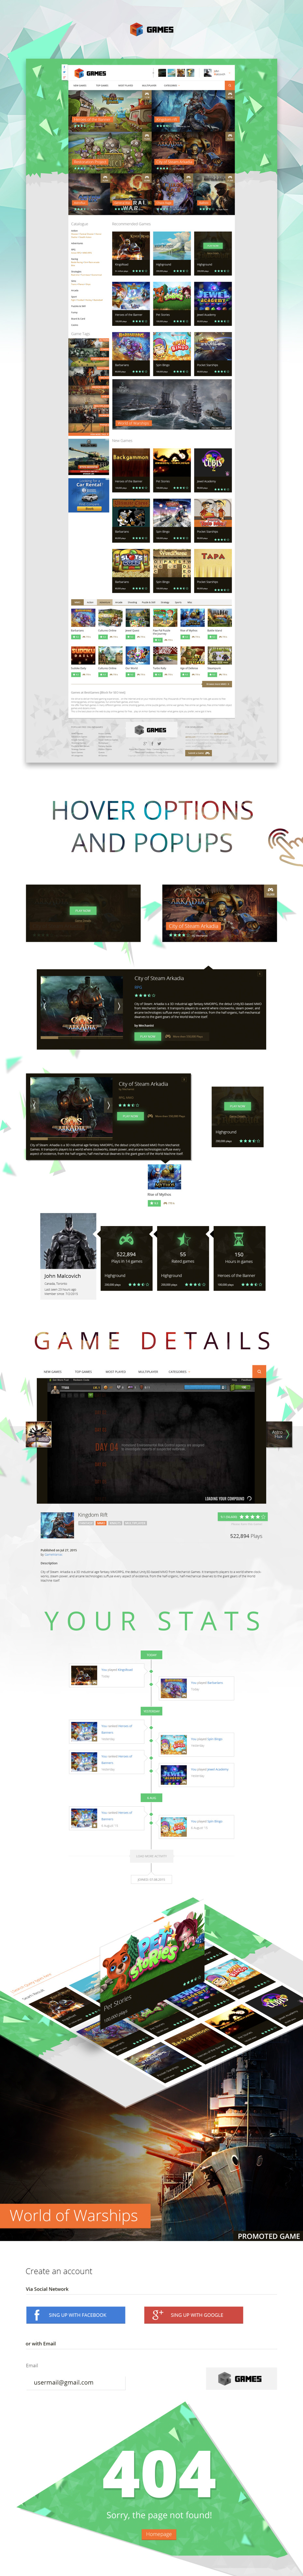 game_presentation